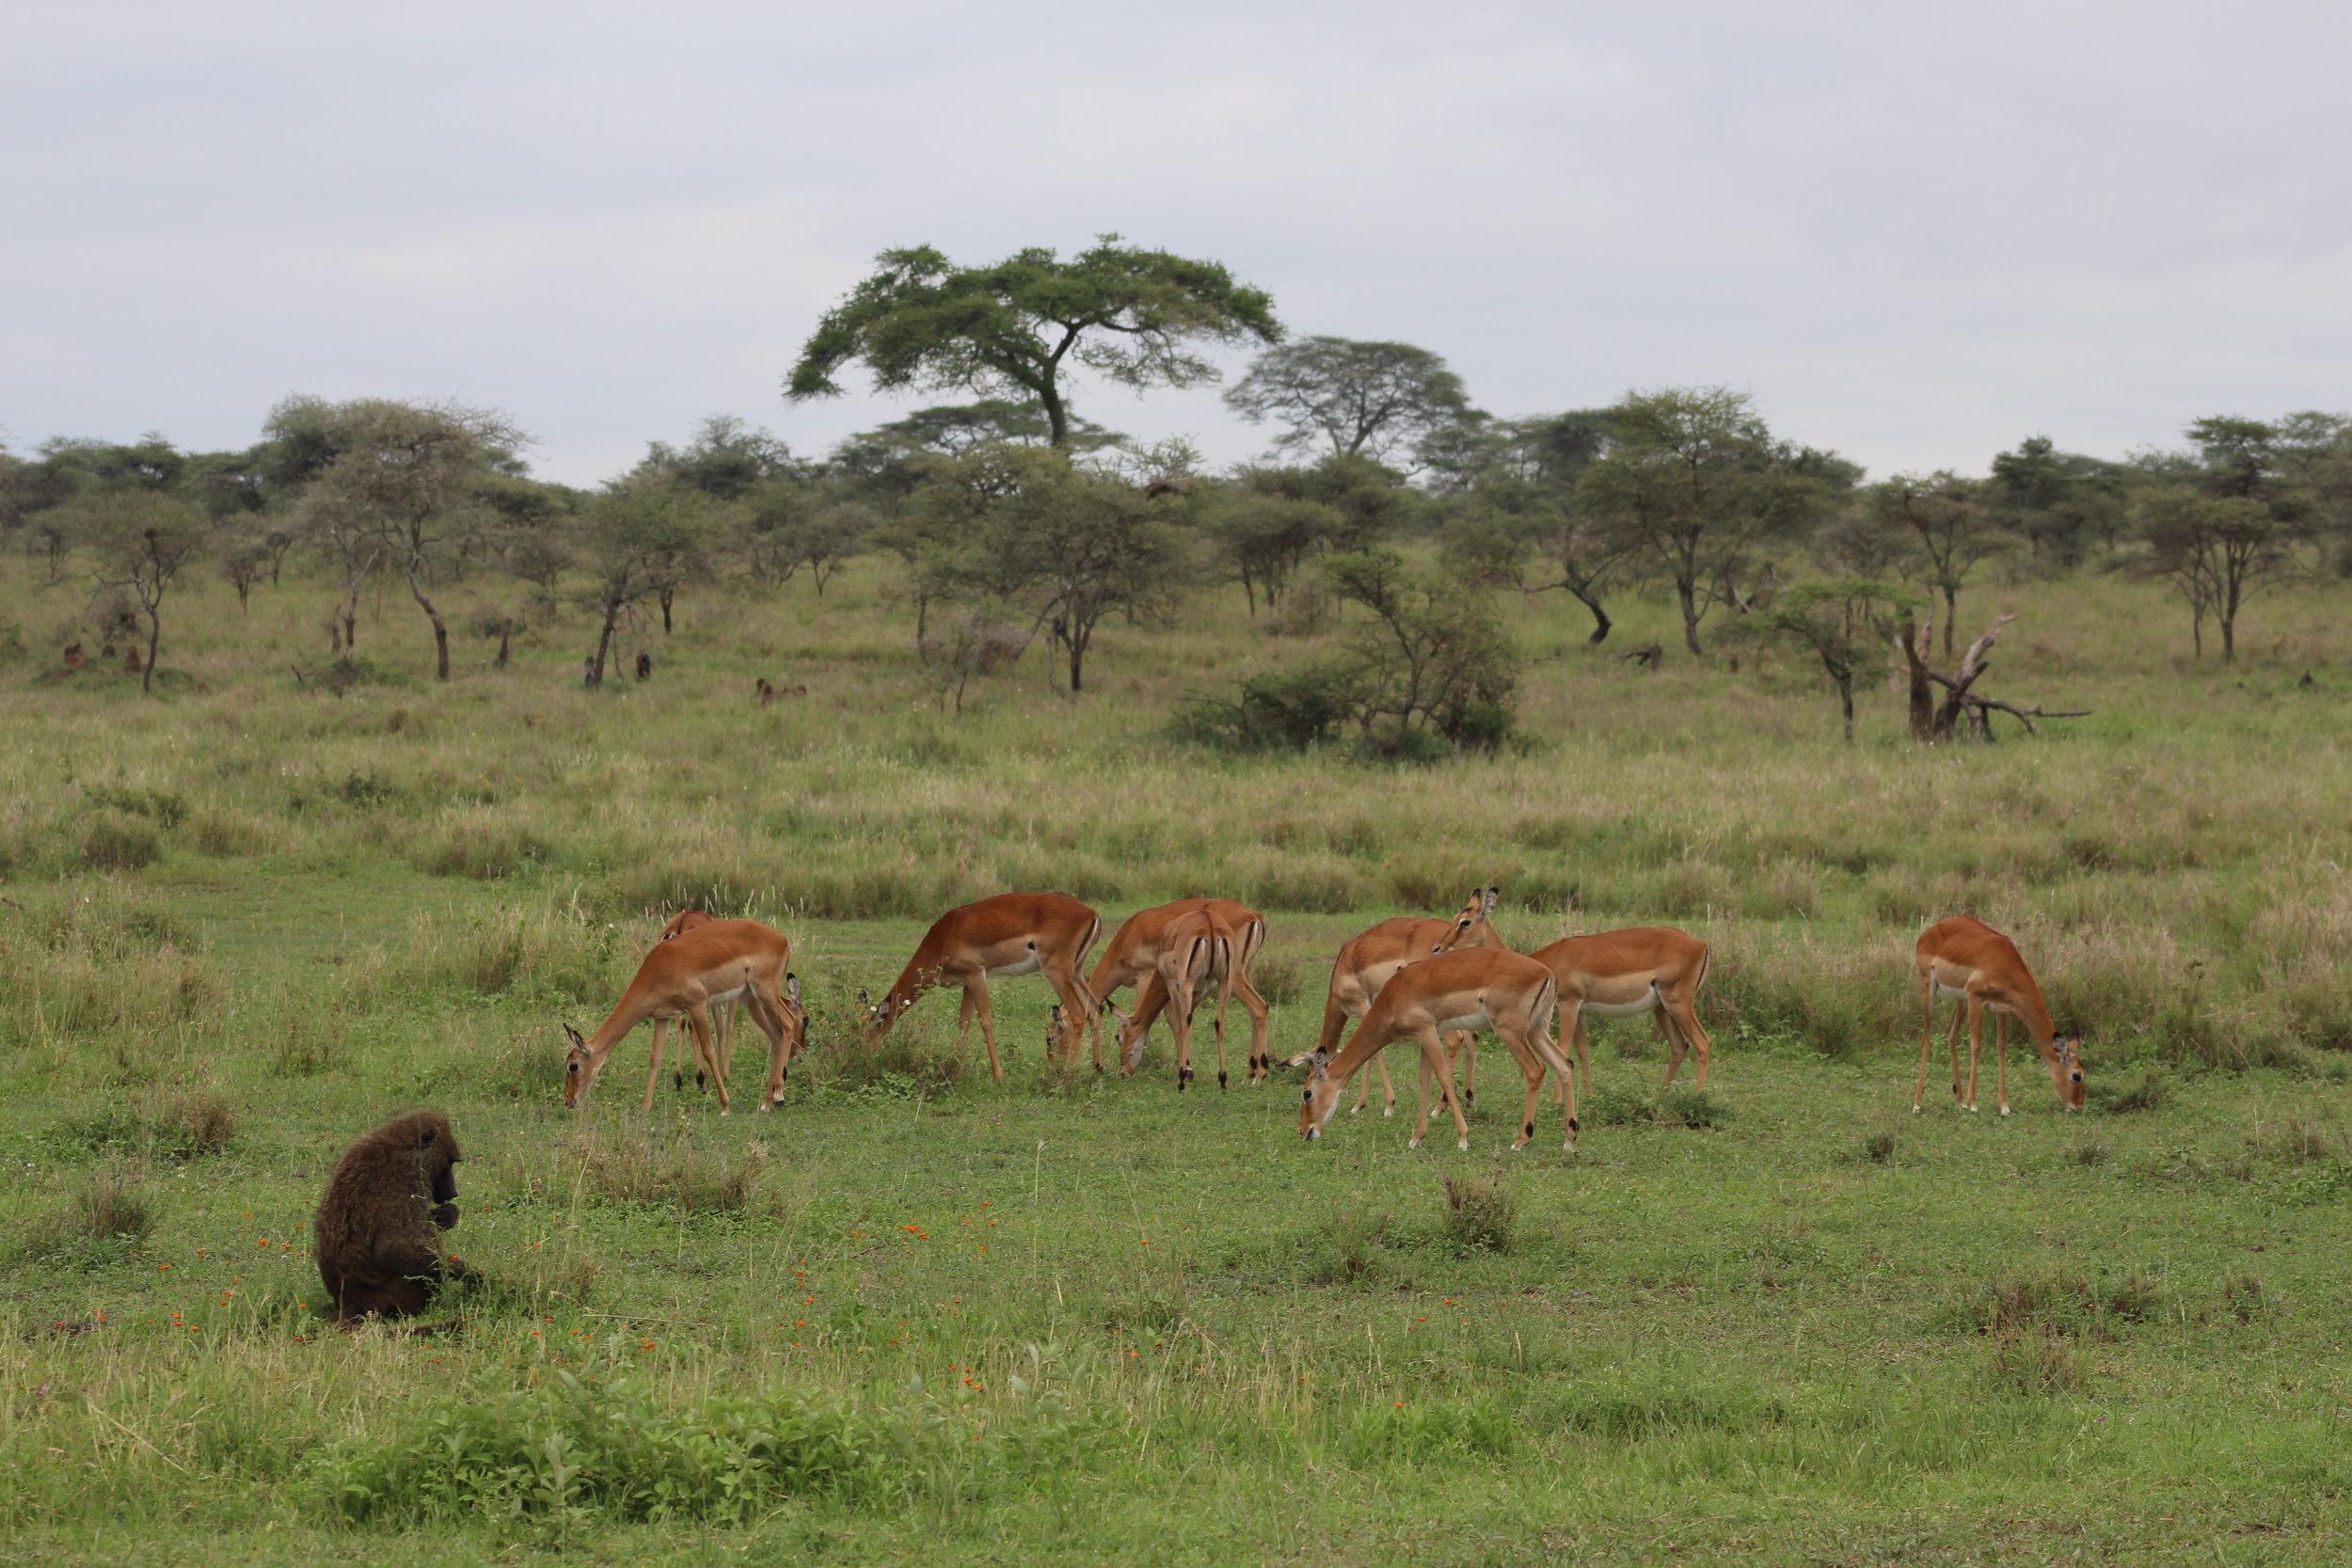 Olive baboon and impala